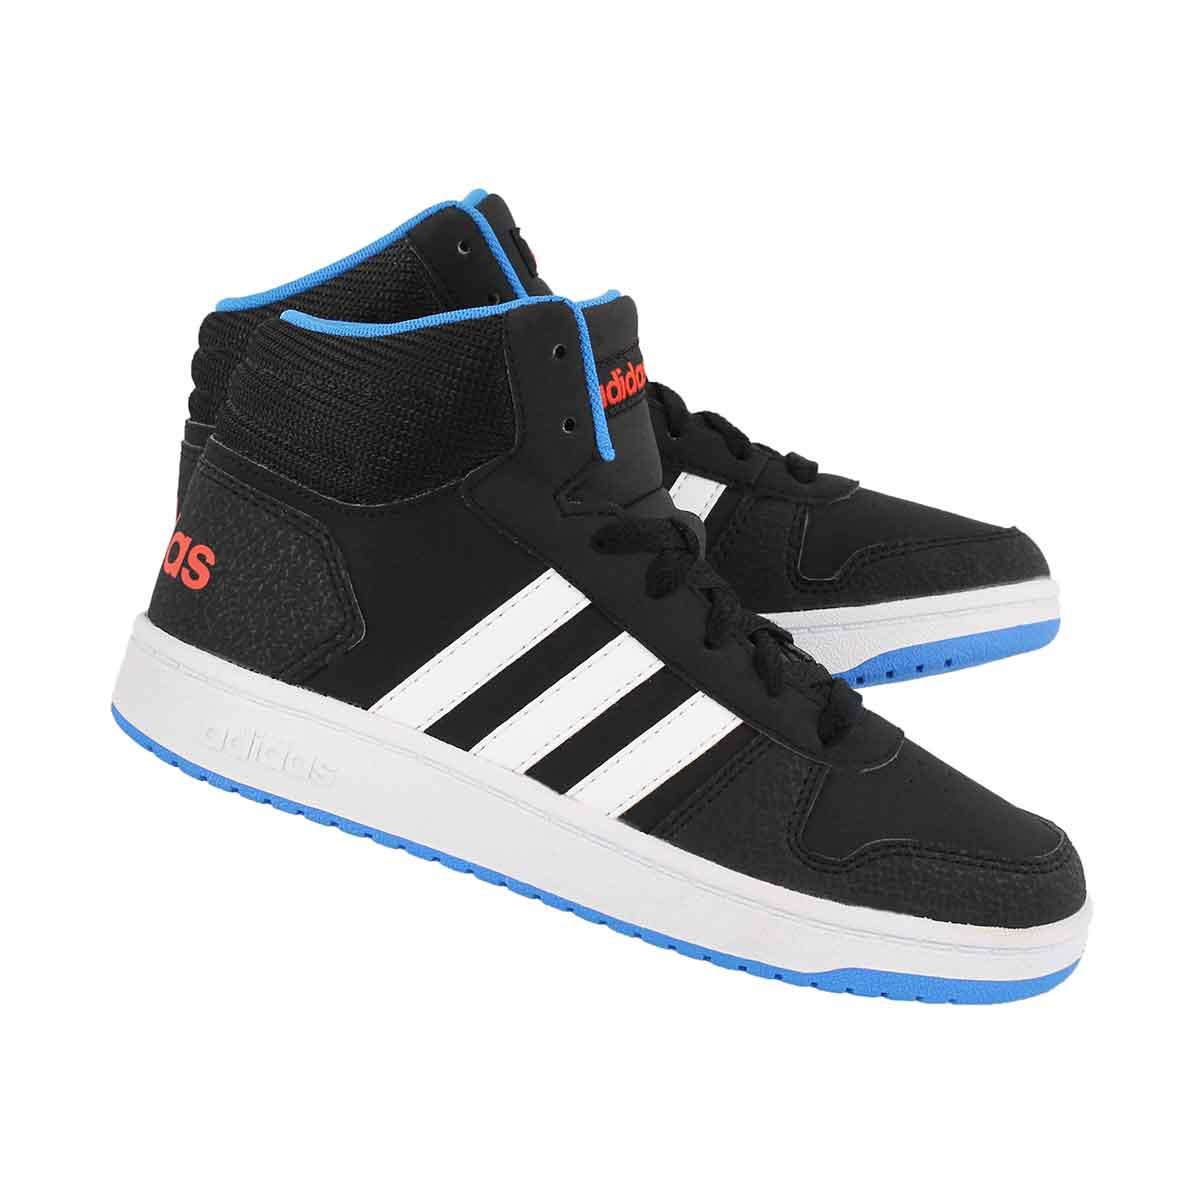 Bys V5 Hoops Mid 2.0 blk/ blu sneaker